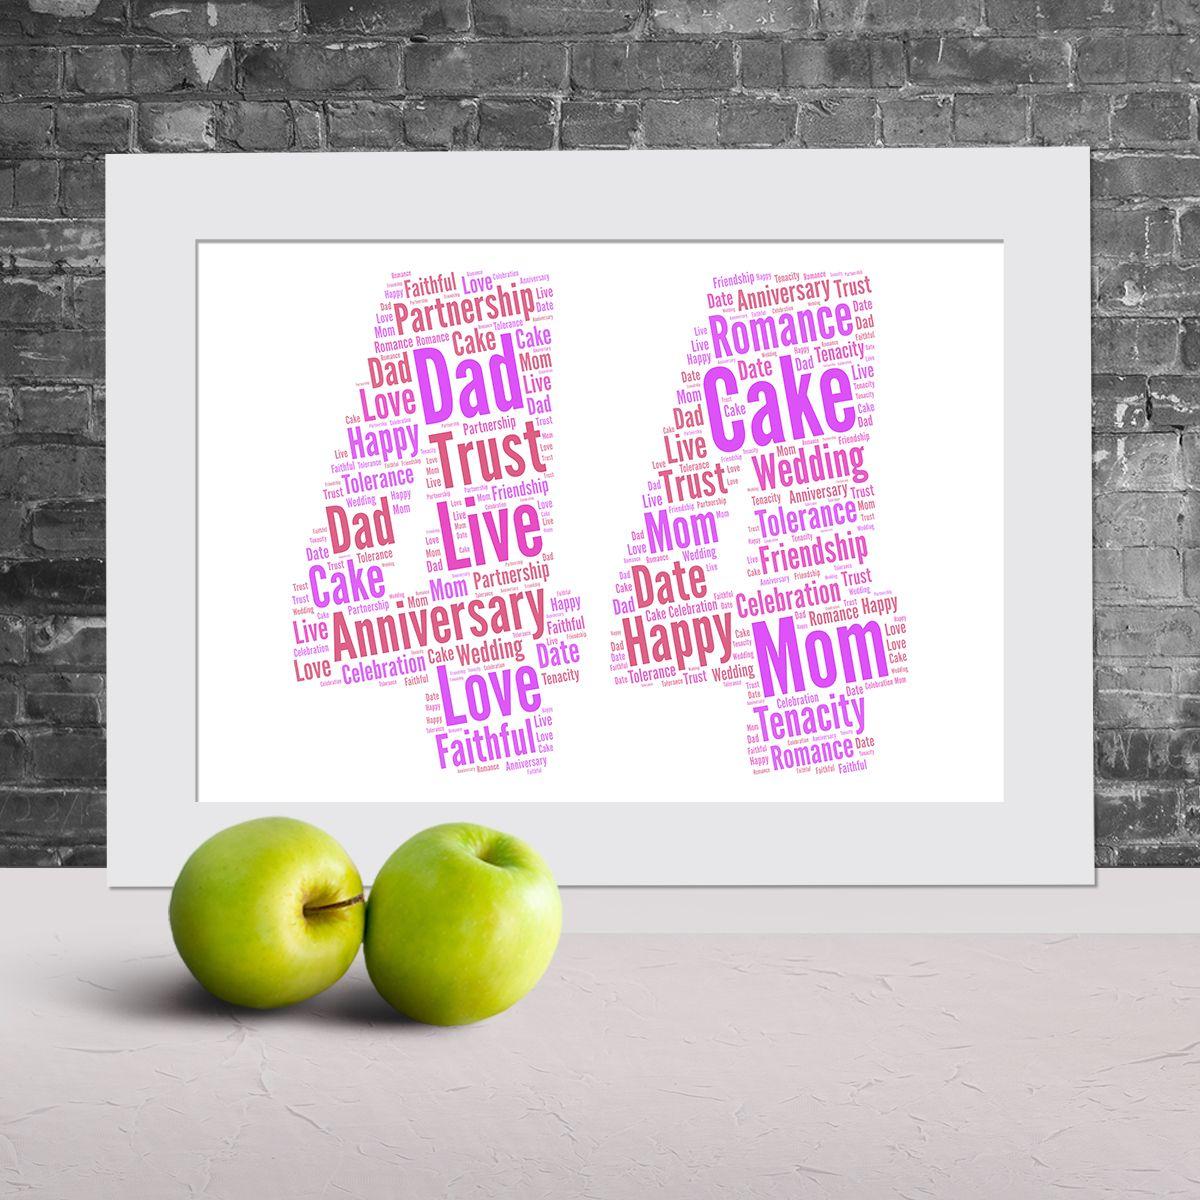 44th anniversary word art word art prints word art app